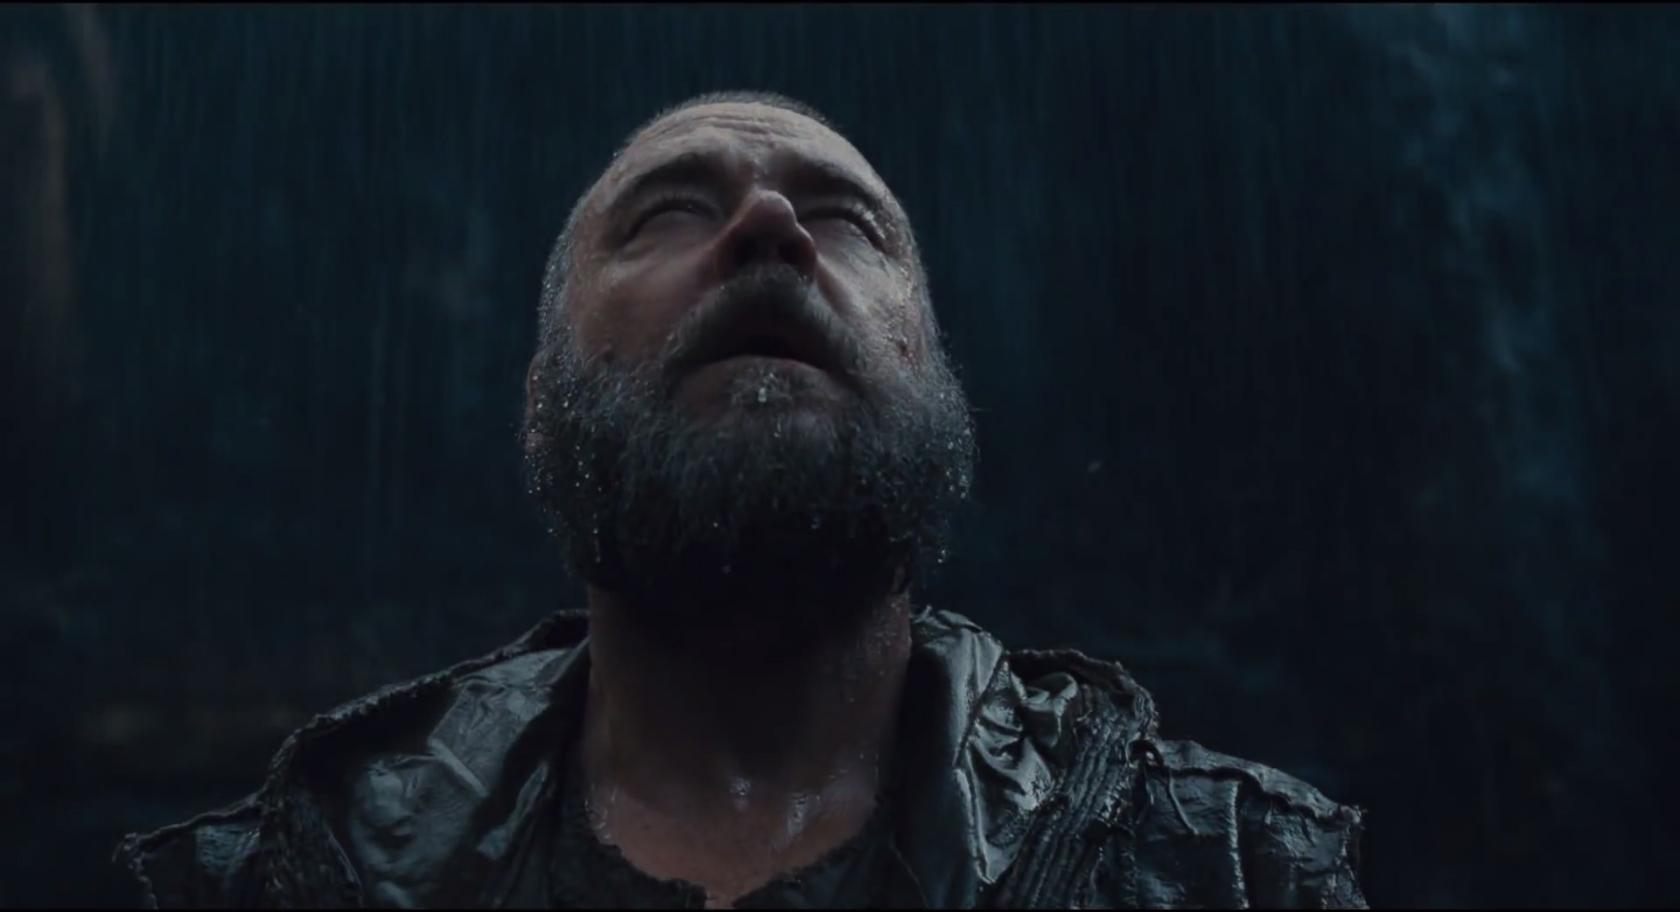 noah trailer 1 review tims film reviews